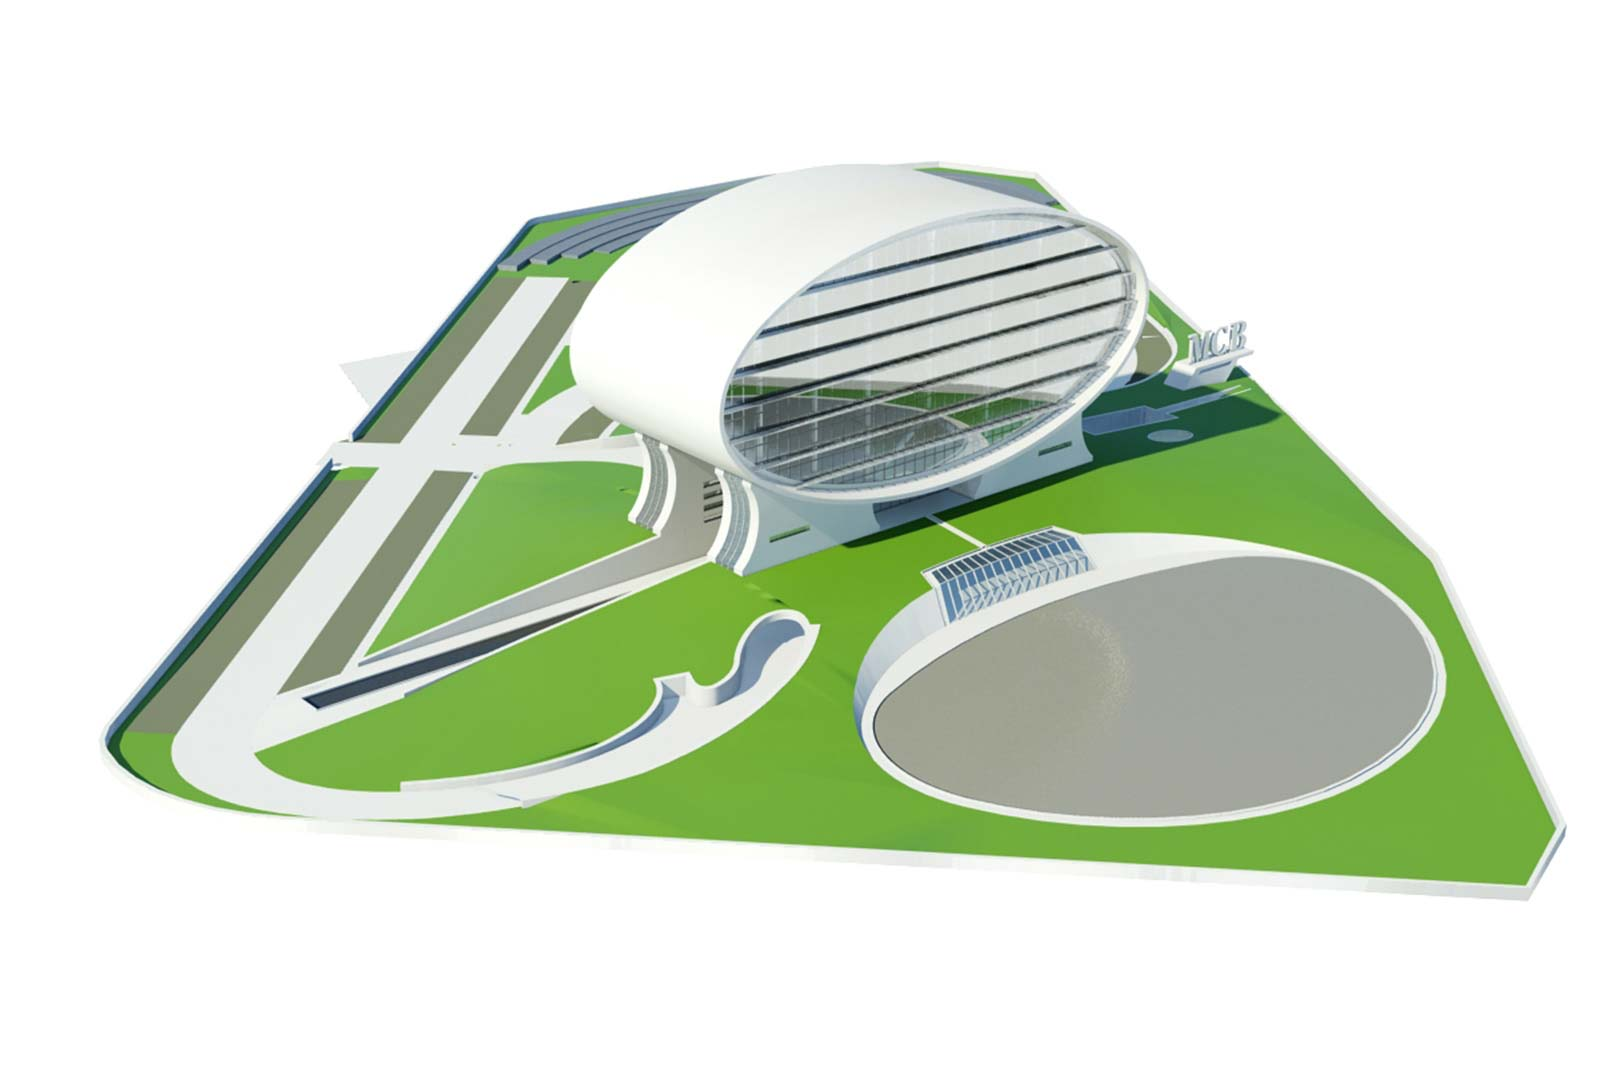 the-mauritius-commercial-bank-ebene-jean-francois-koenig-concept